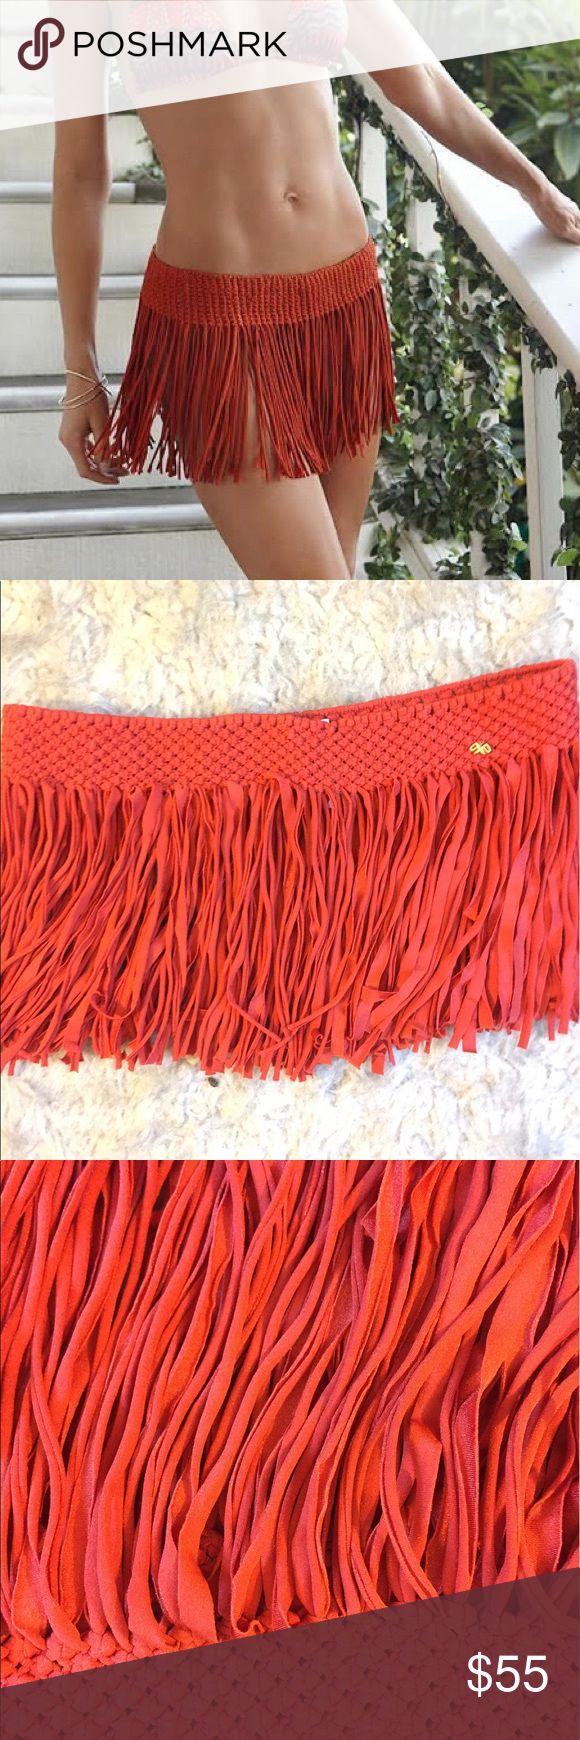 PilyQ sarong fringe bathing suit skirt Never worn. Dolce Vita Swim Sarongs